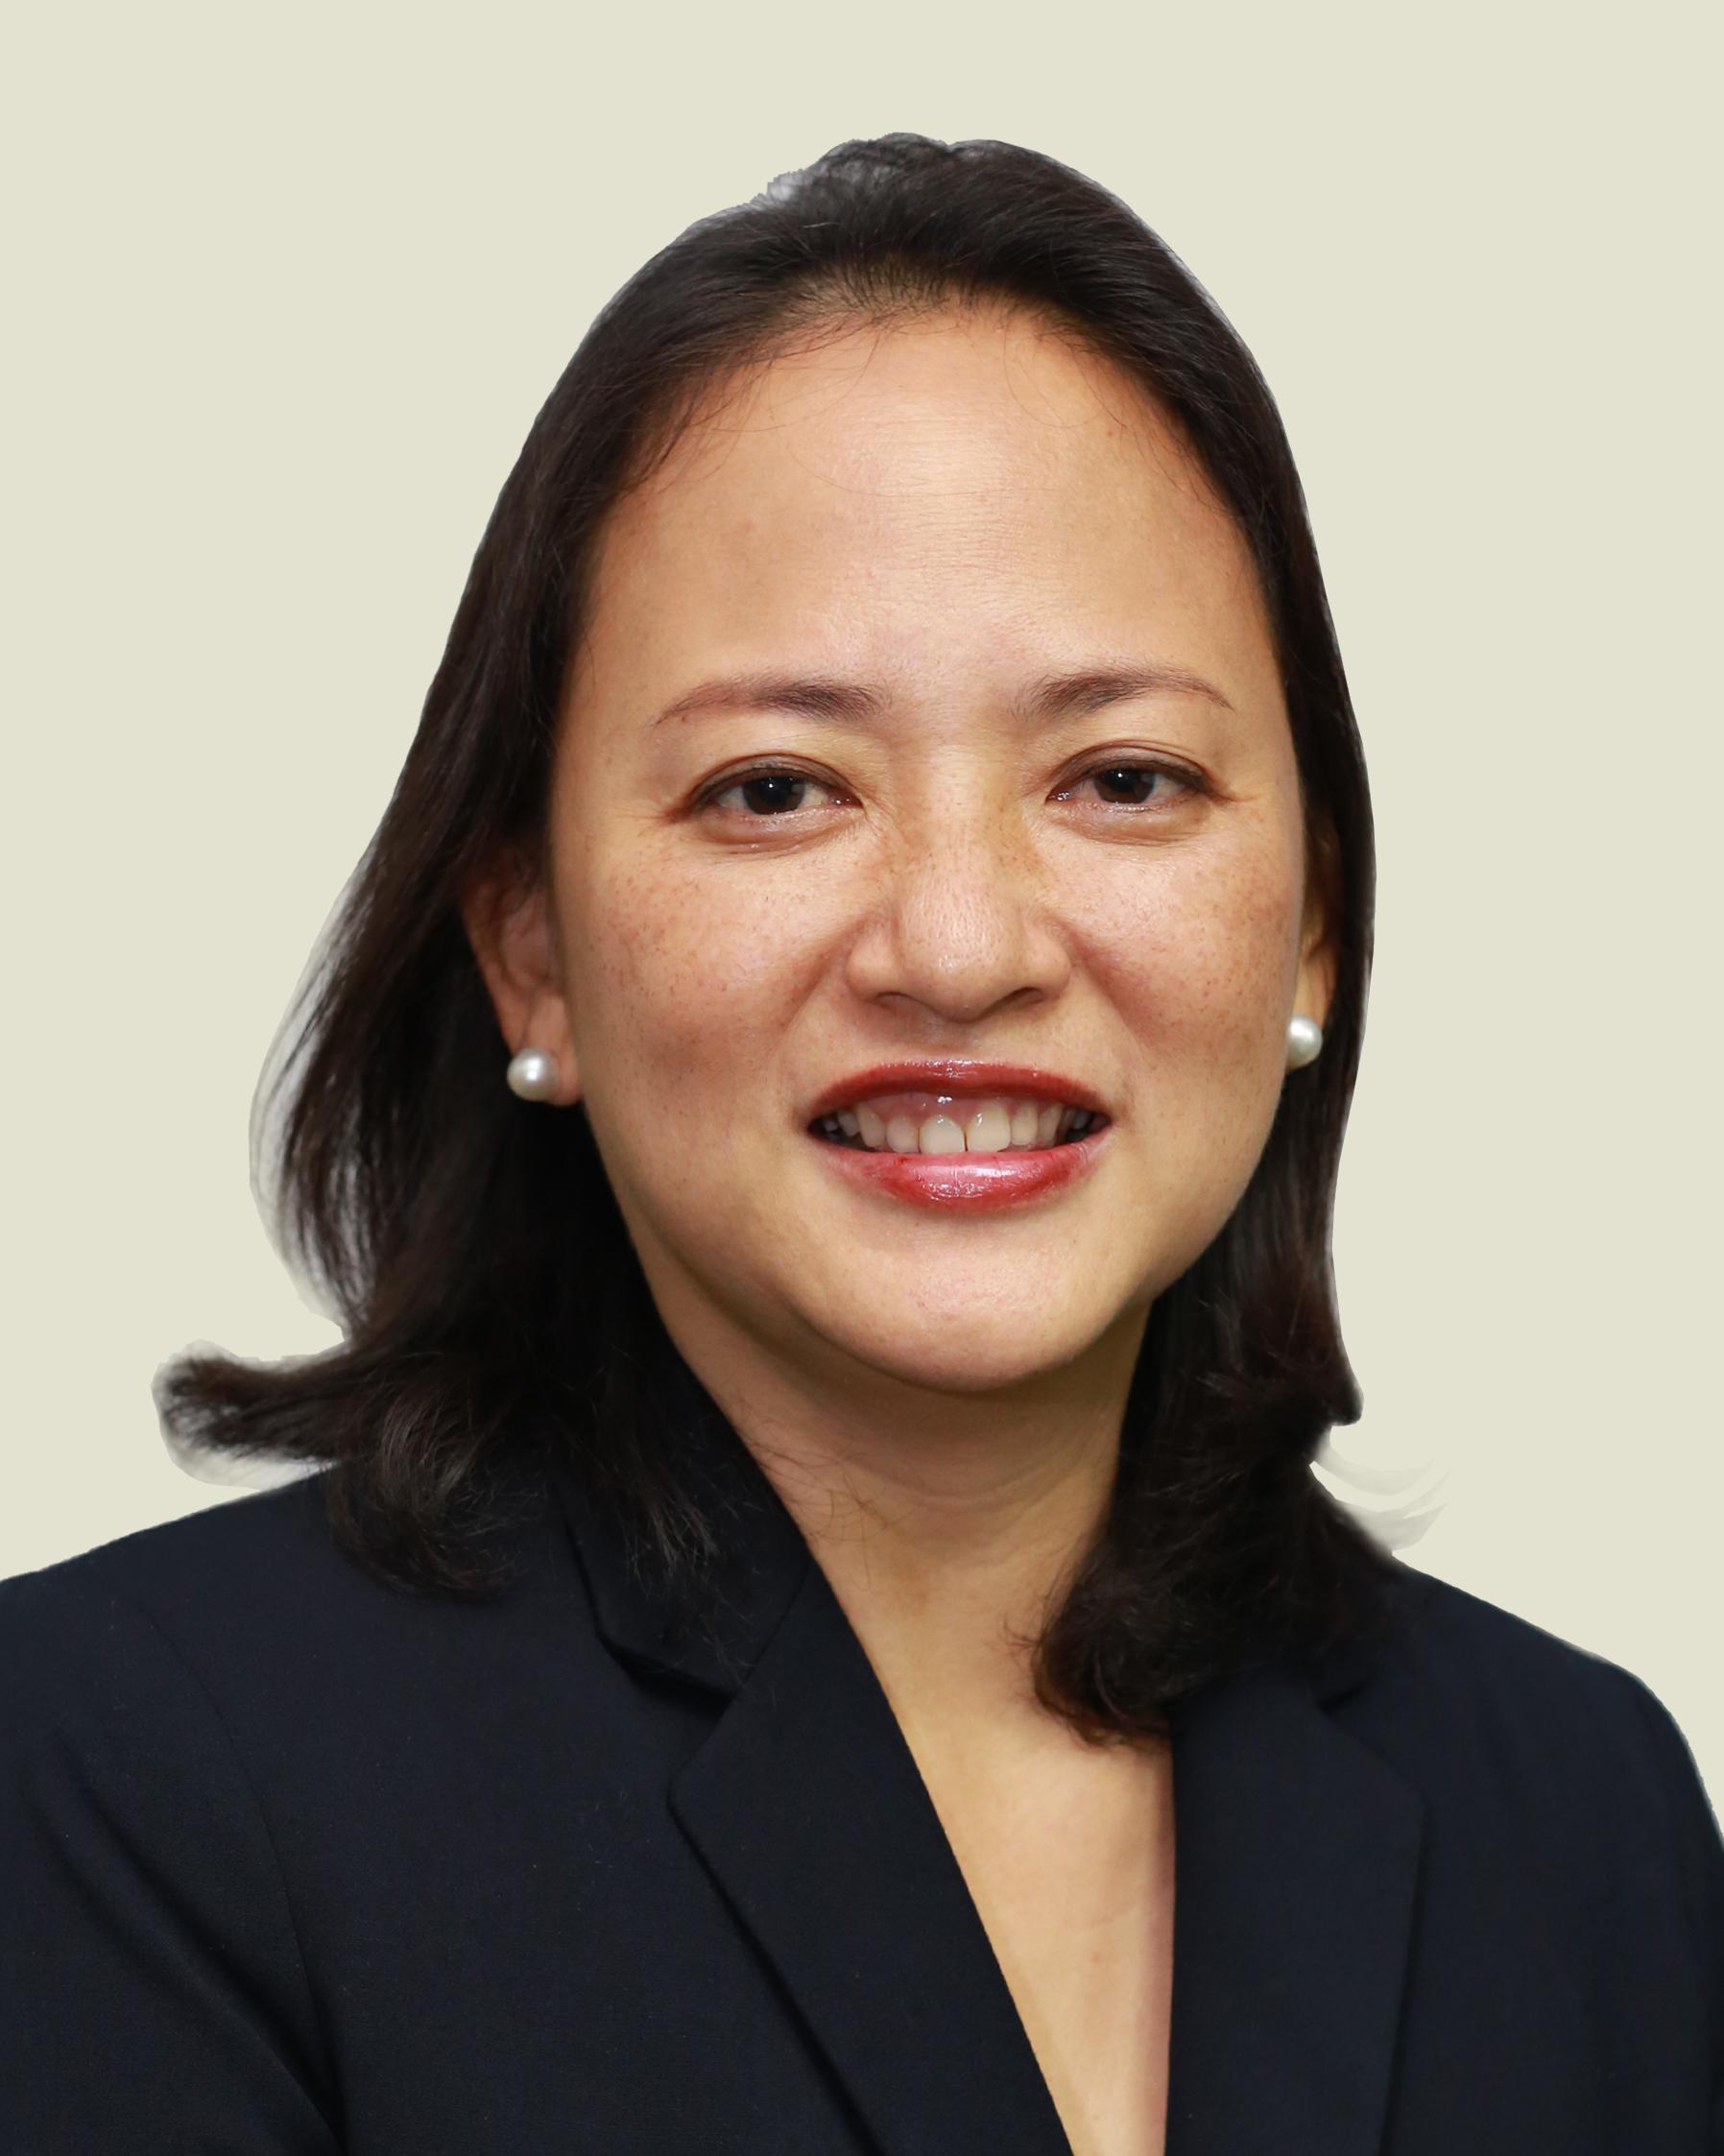 Maria Margarita Vecin